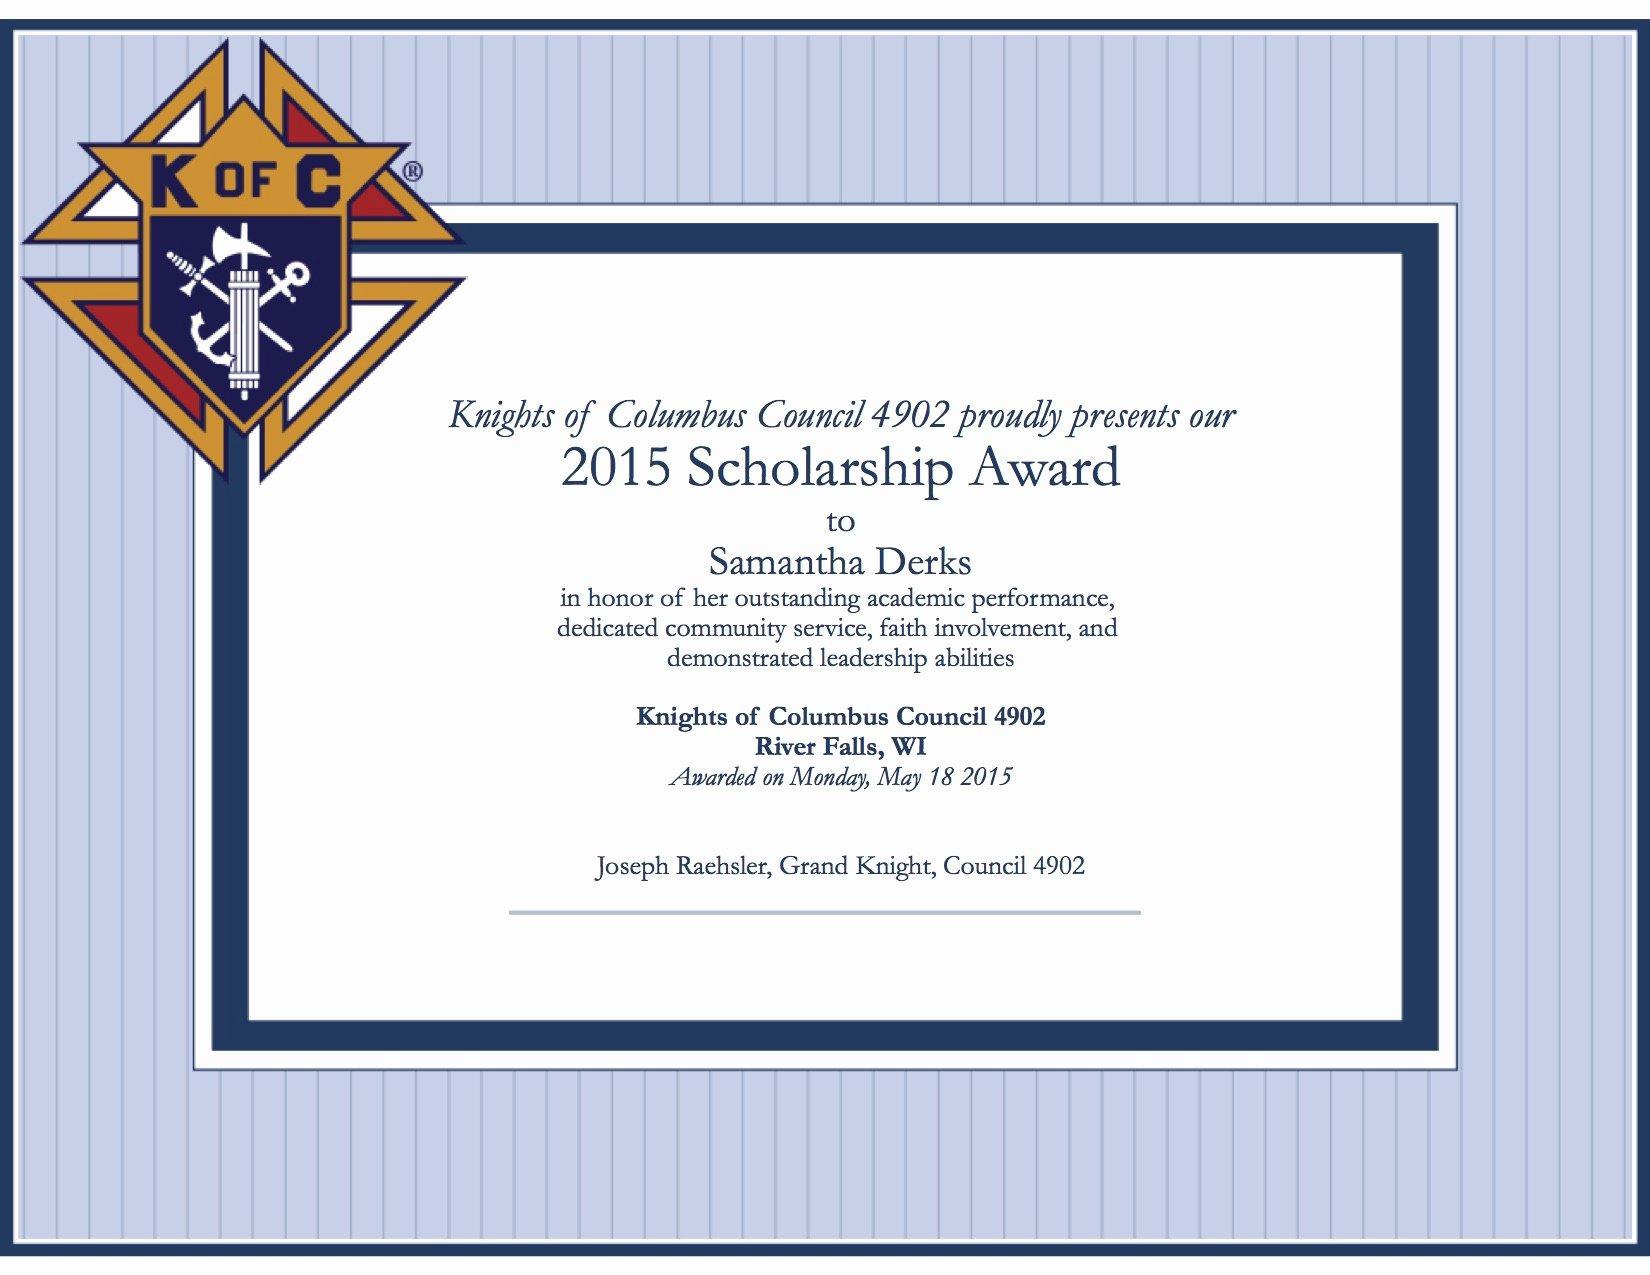 Scholarship Award Certificate Templates Luxury Scholarship Winners – Knights Of Columbus 4902 River